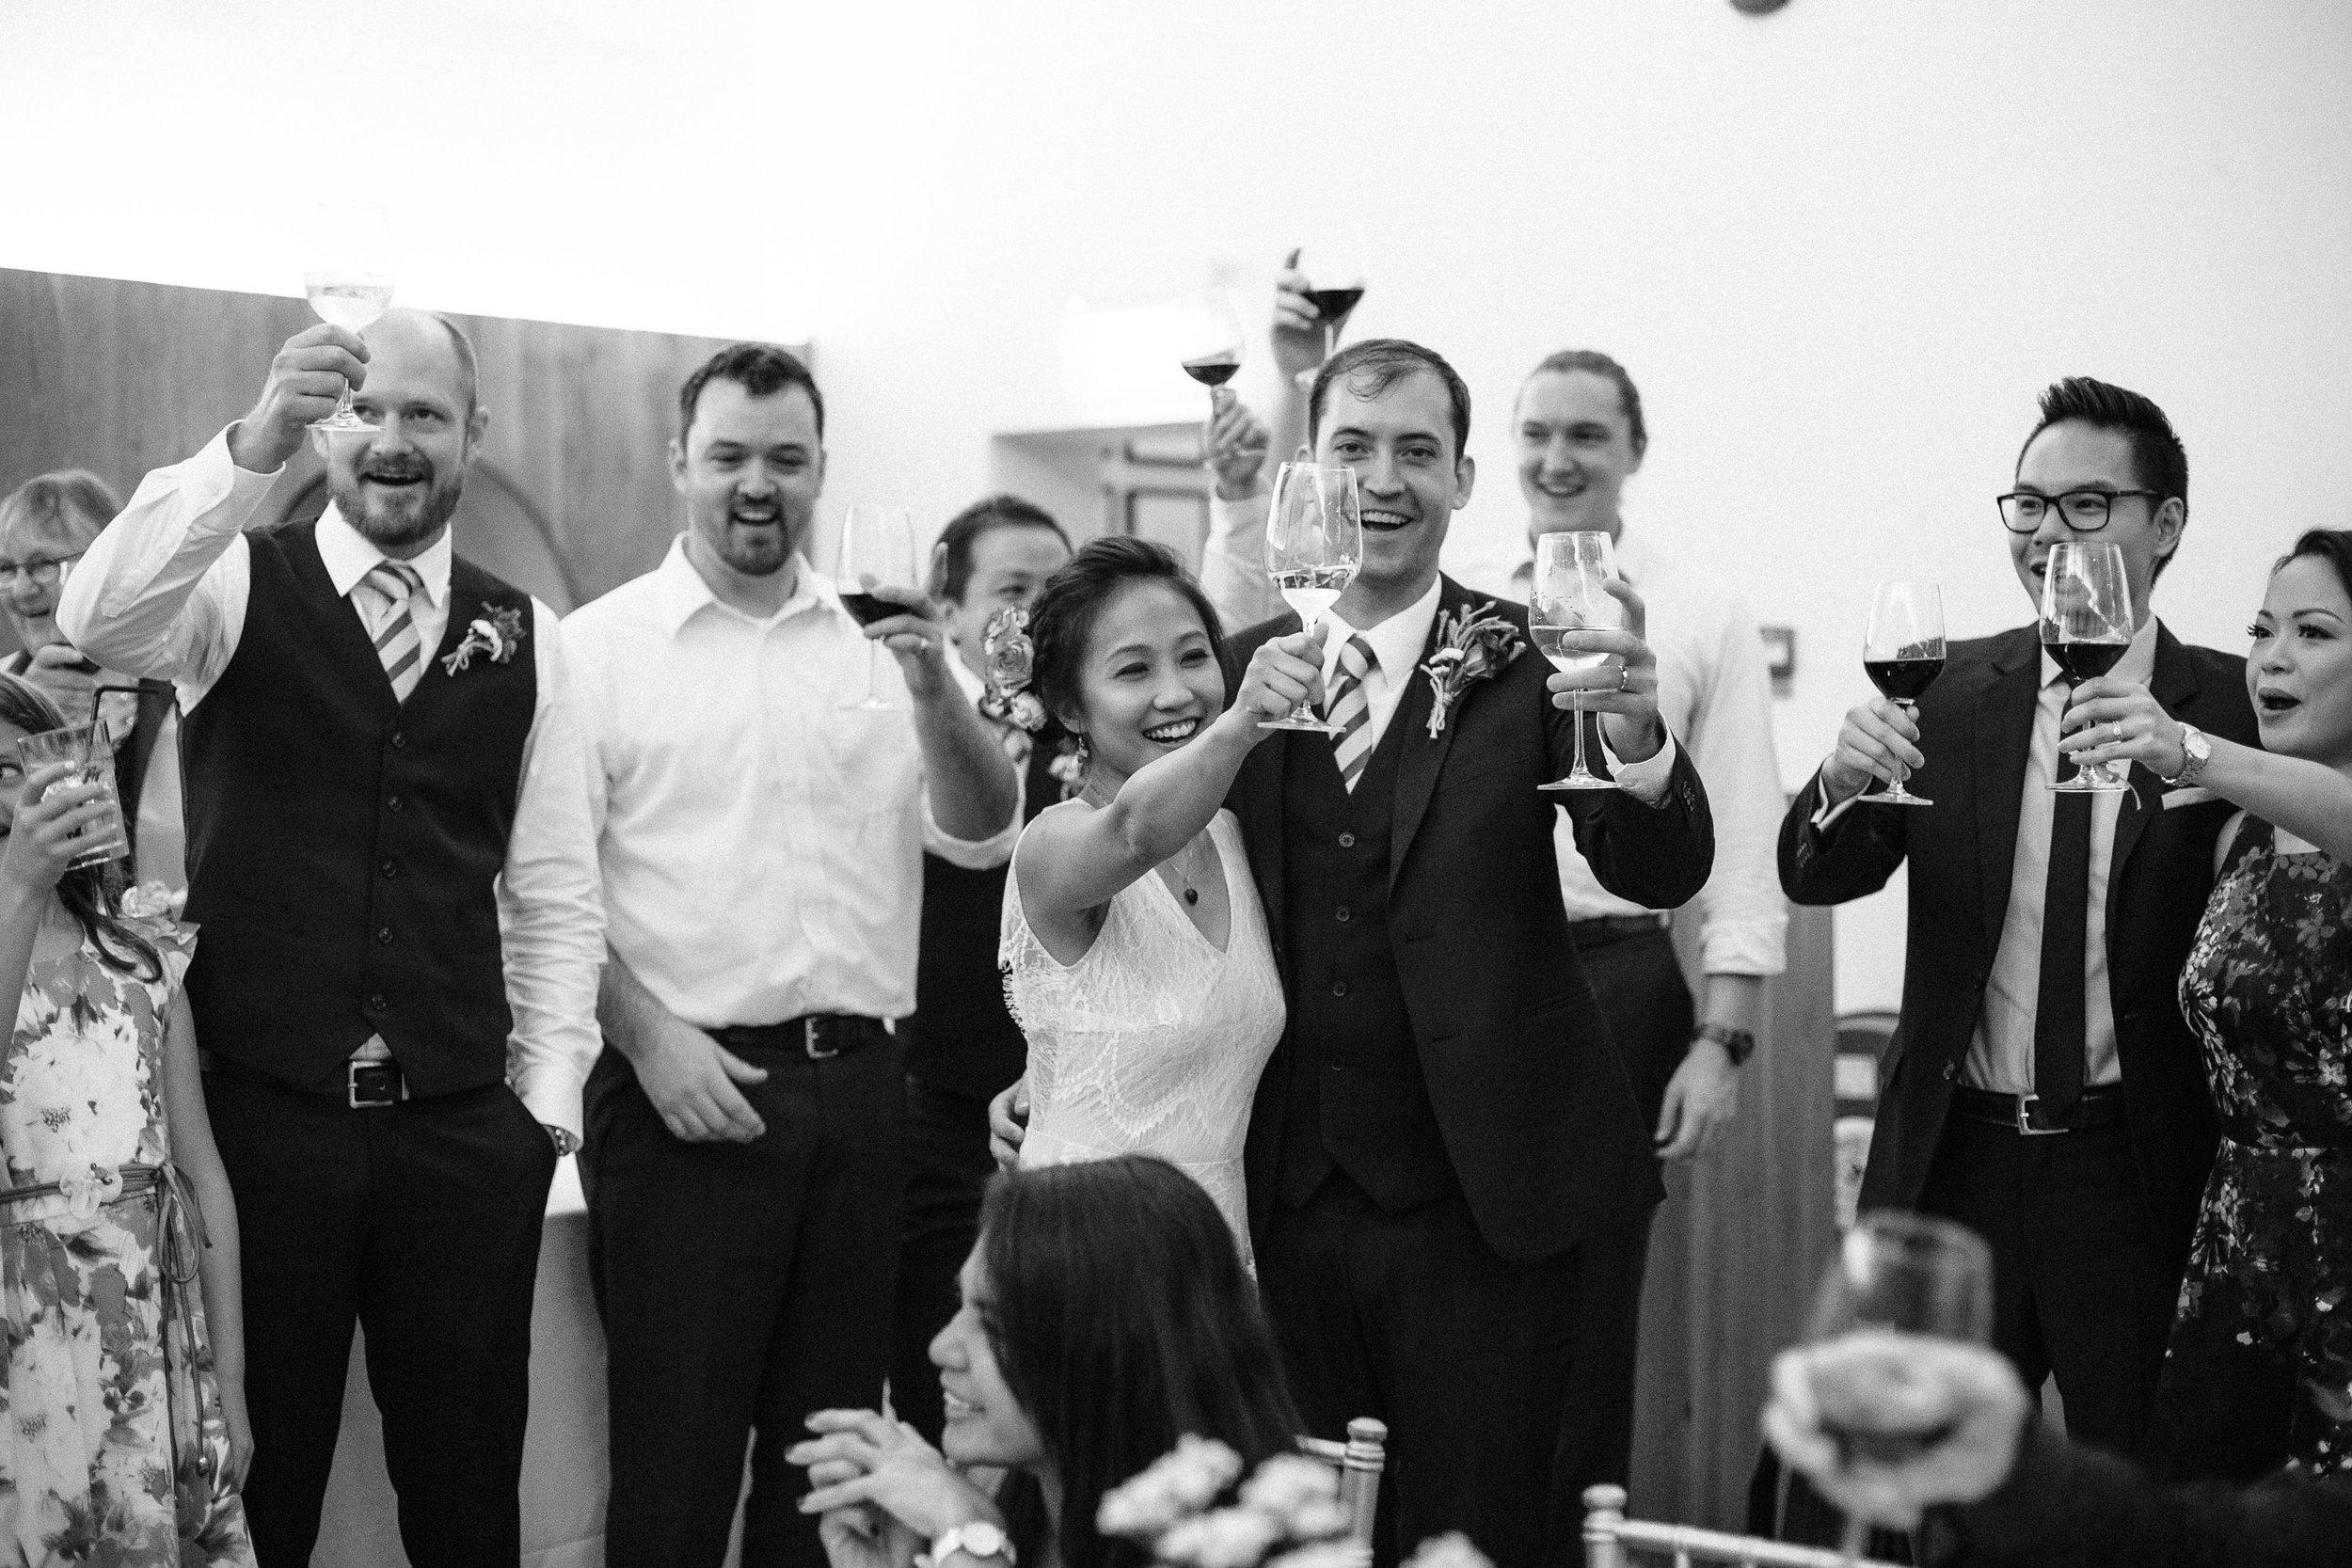 singapore-wedding-photographer-hiram-joyce-069.jpg